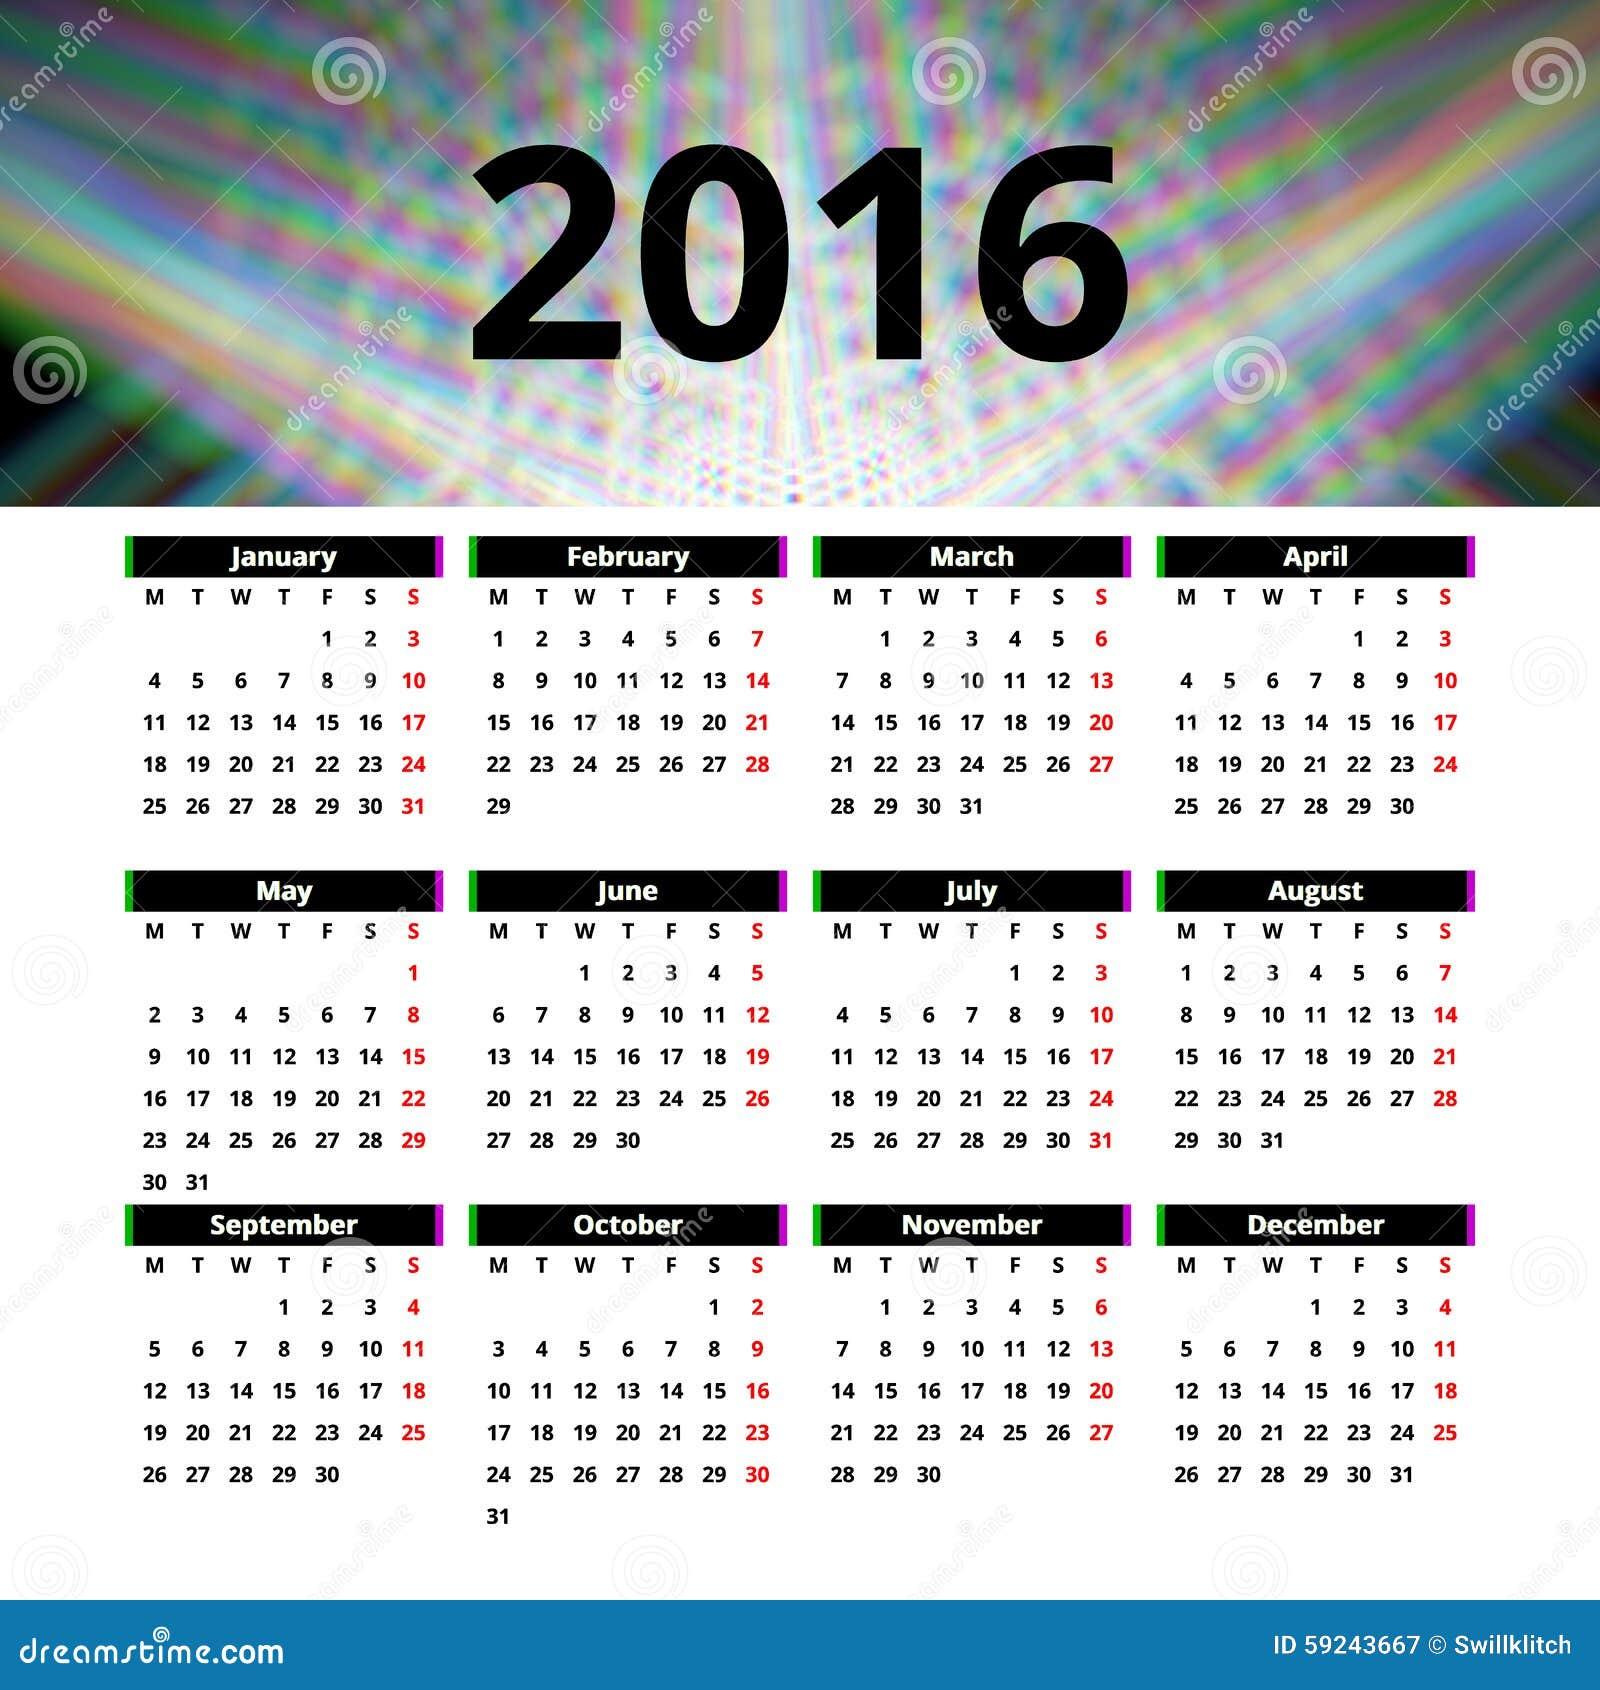 Calendar Header Design : Calendar template design with header picture starts